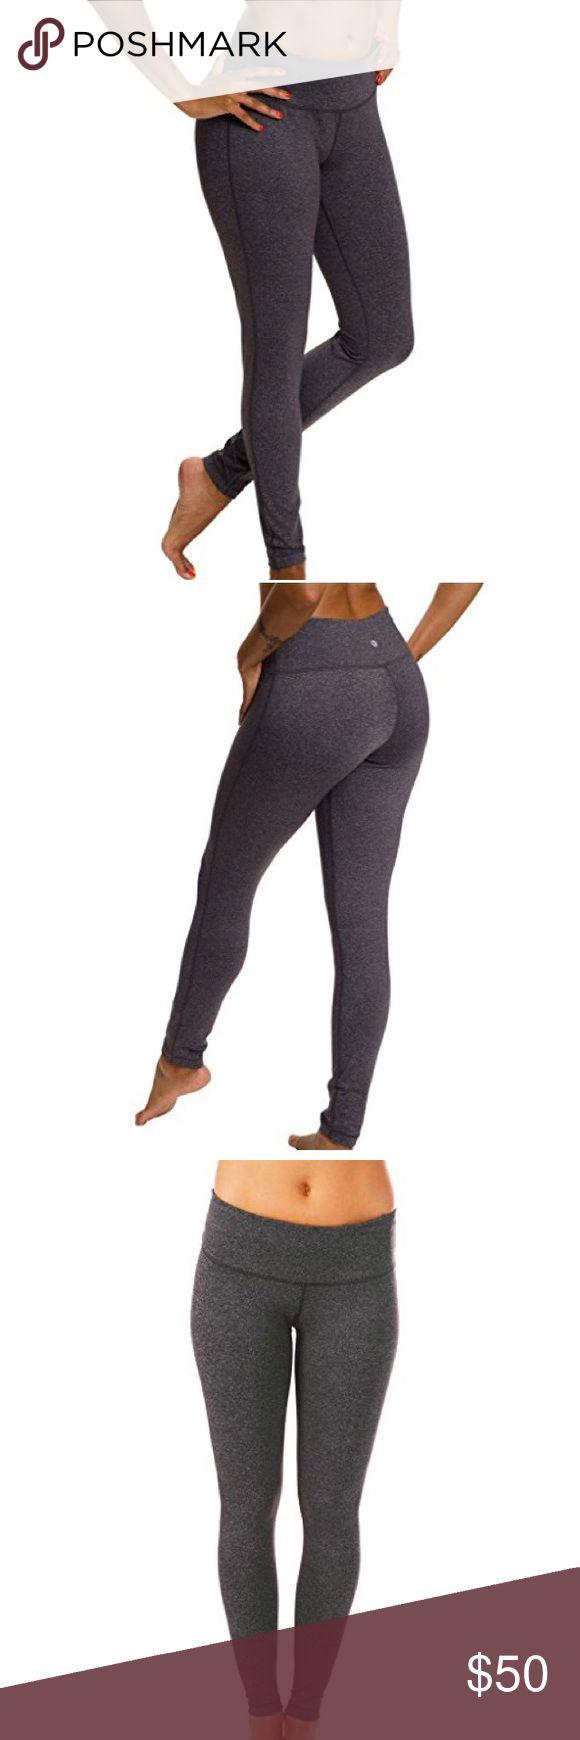 NWT 90 DEGREES BY REFLEX GRAY LEGGINGS SIZE MED NWT 90 Degree by Reflex charcoal gray leggings. Size medium 90 Degrees by Reflex Pants Leggings